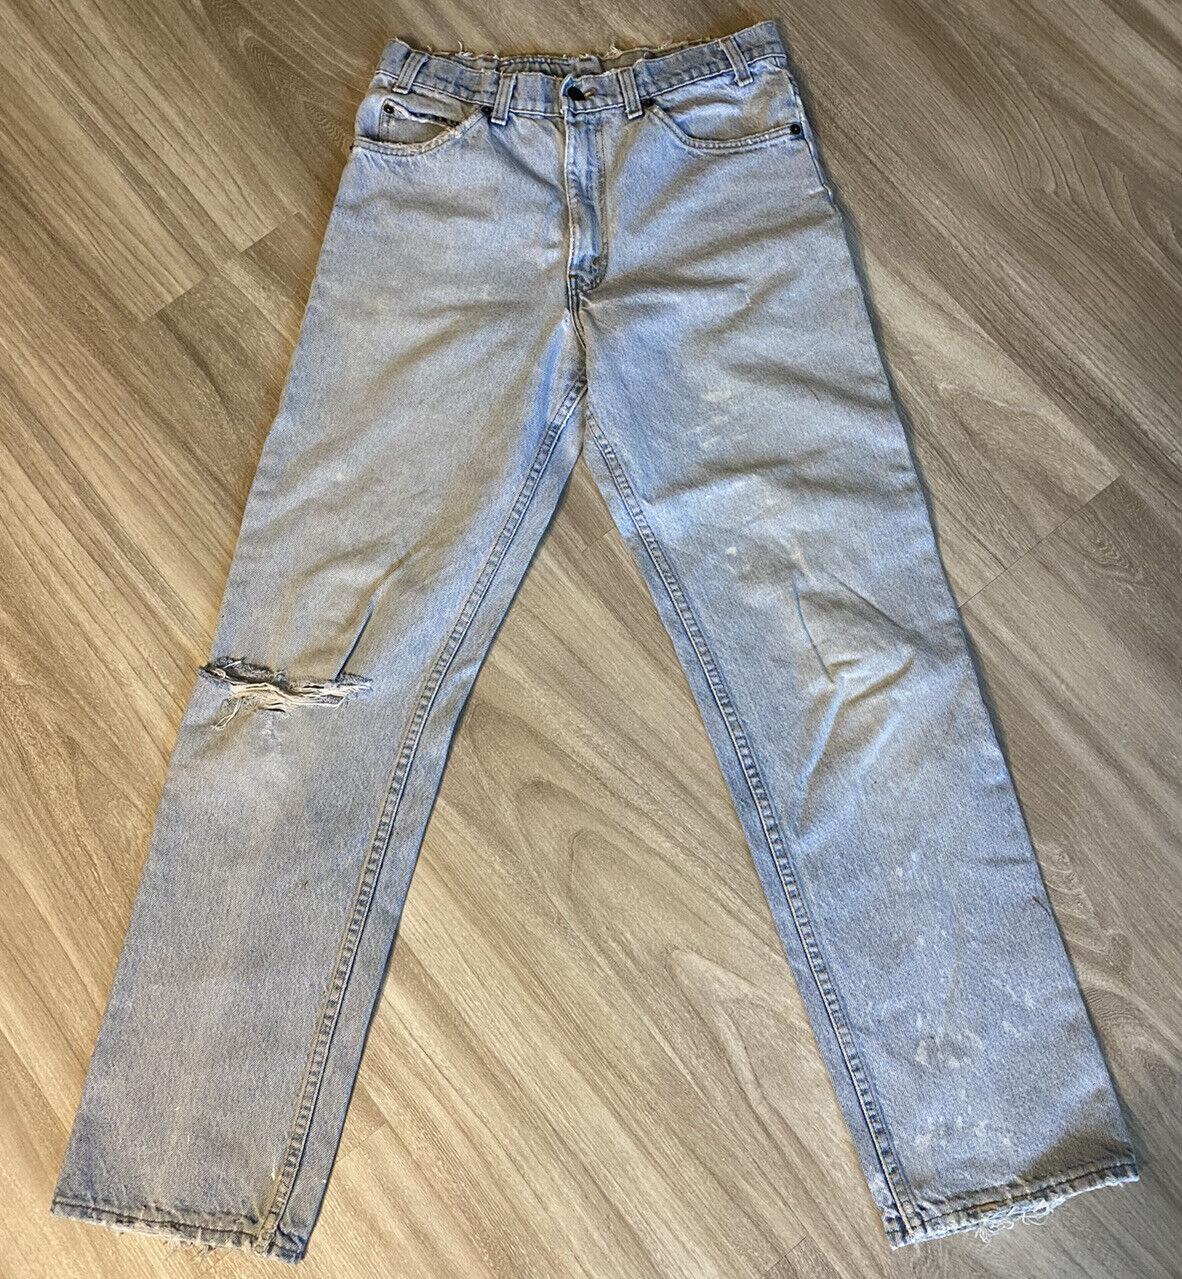 Vintage 90s Levis 540 32 X 32 Distressed Worn Jea… - image 1